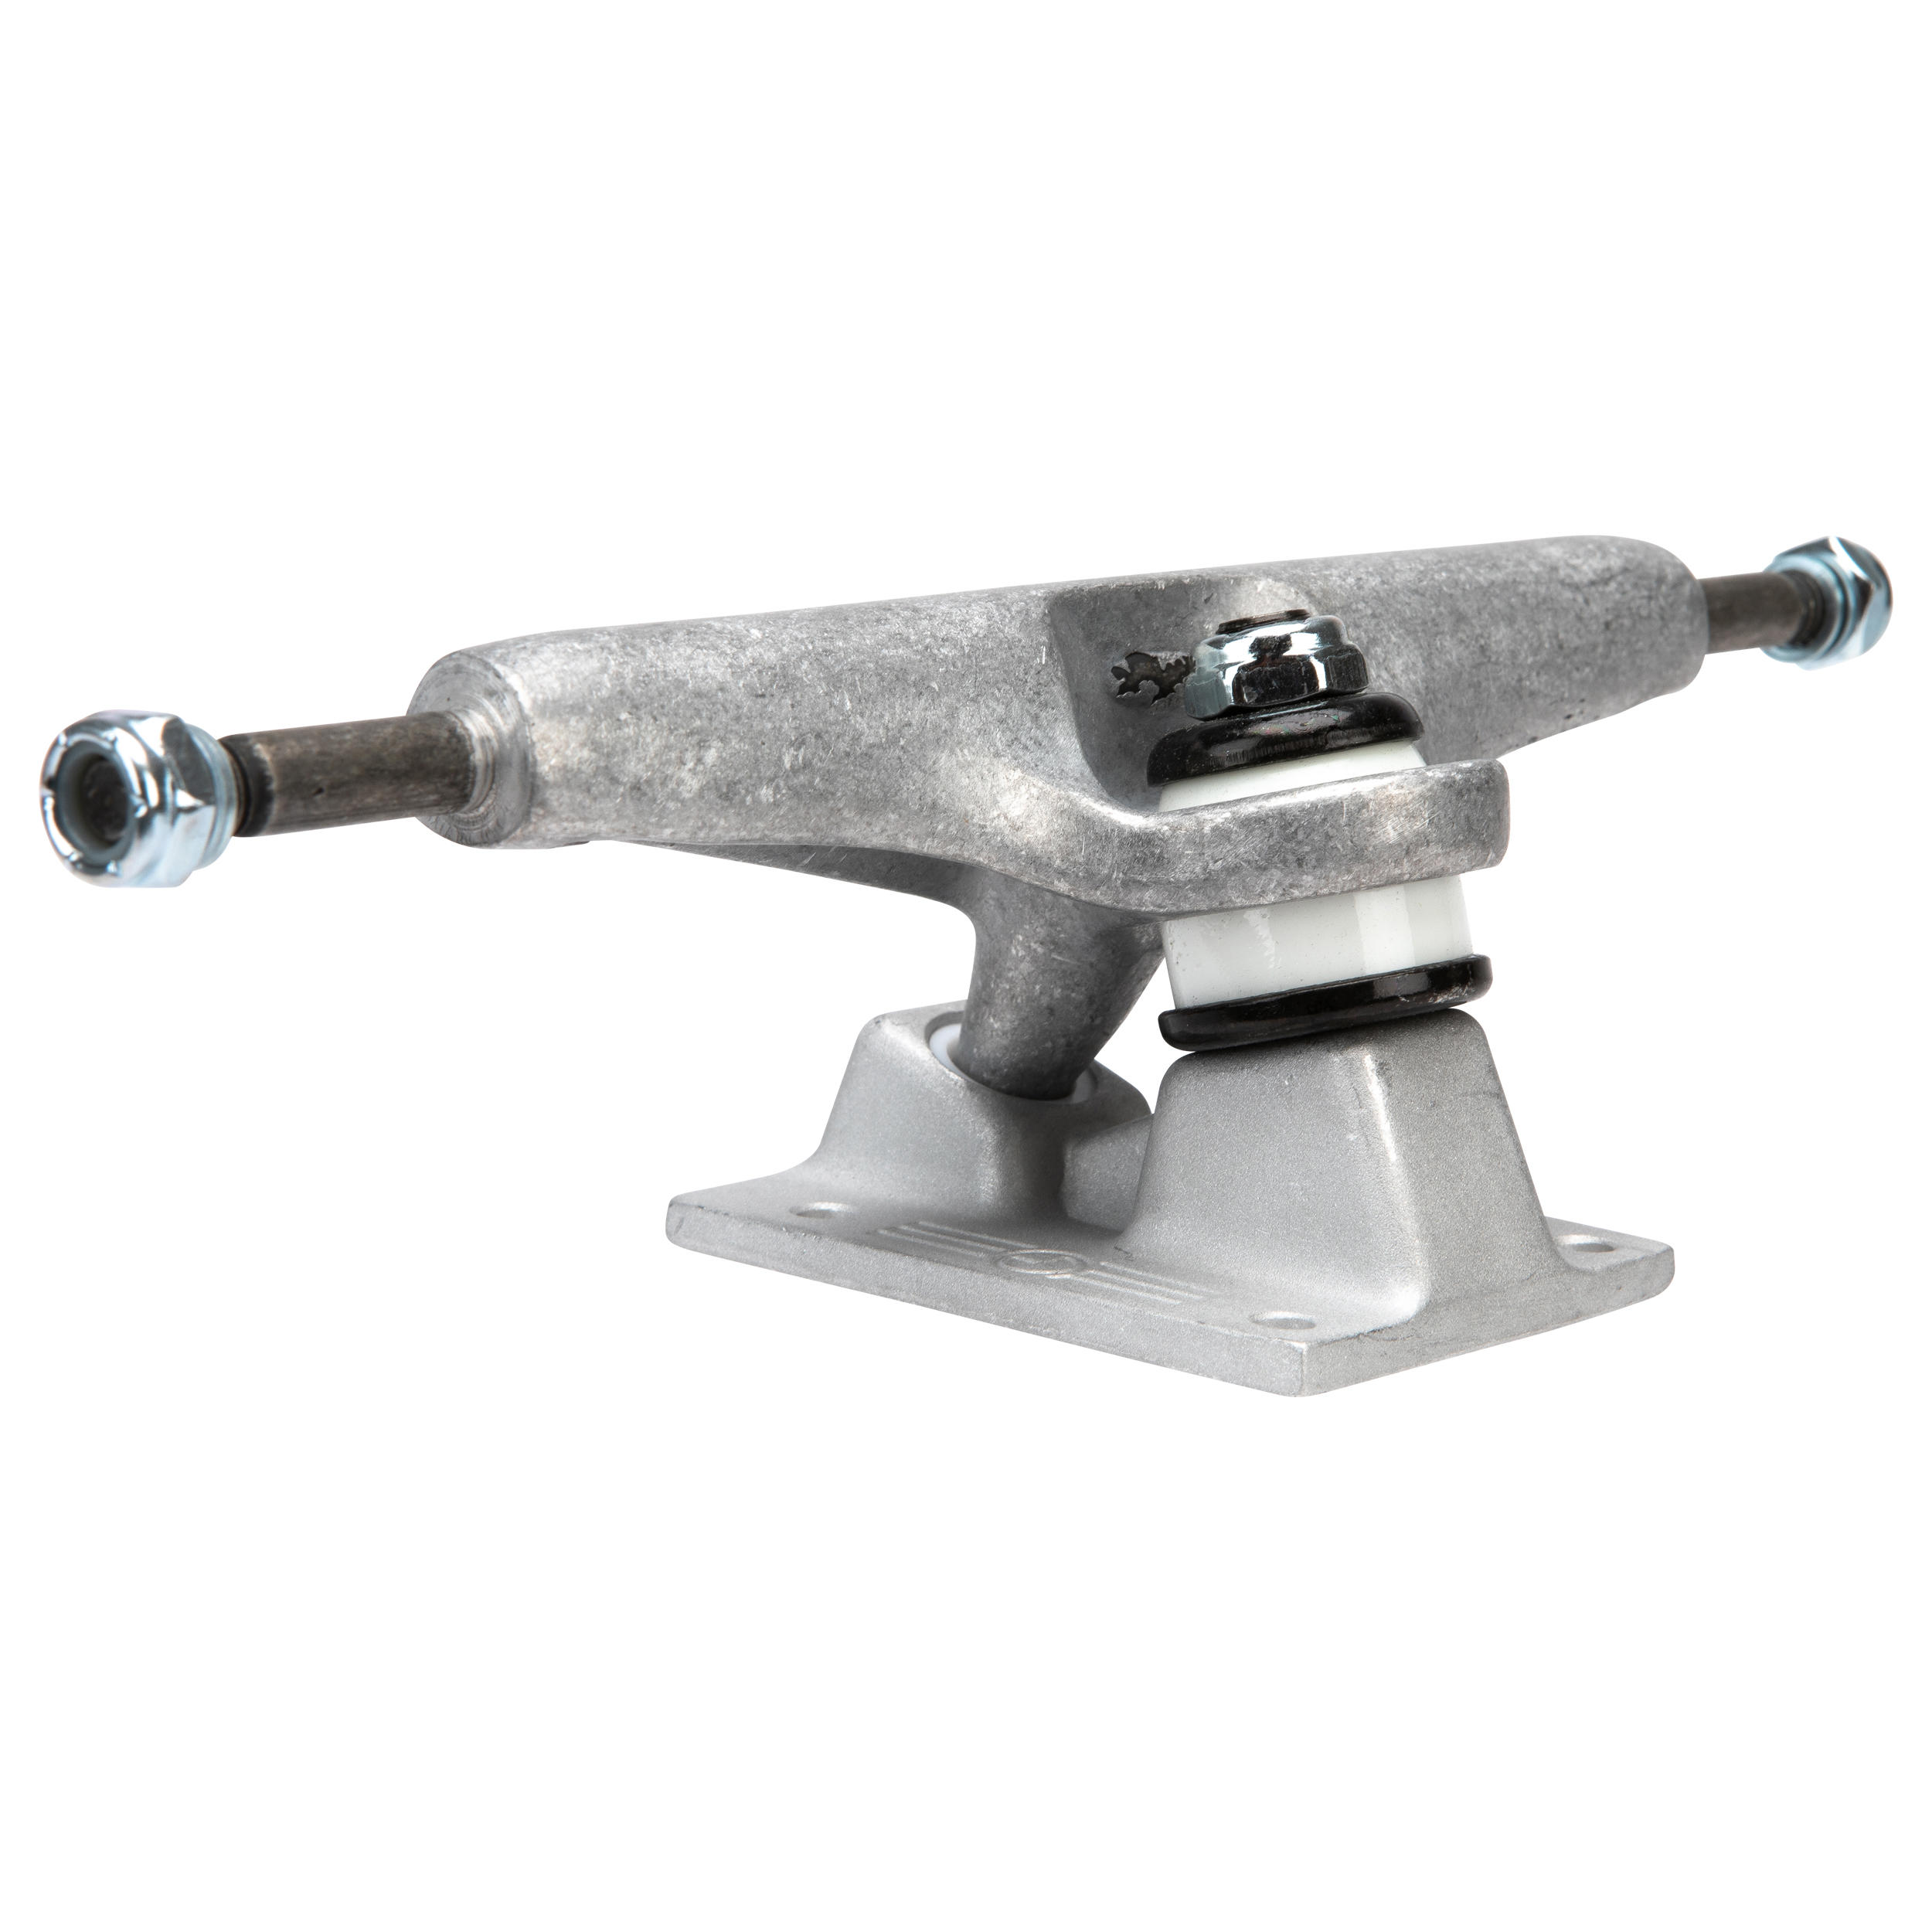 "Truck Skateboard Fury 8.5"" imagine"